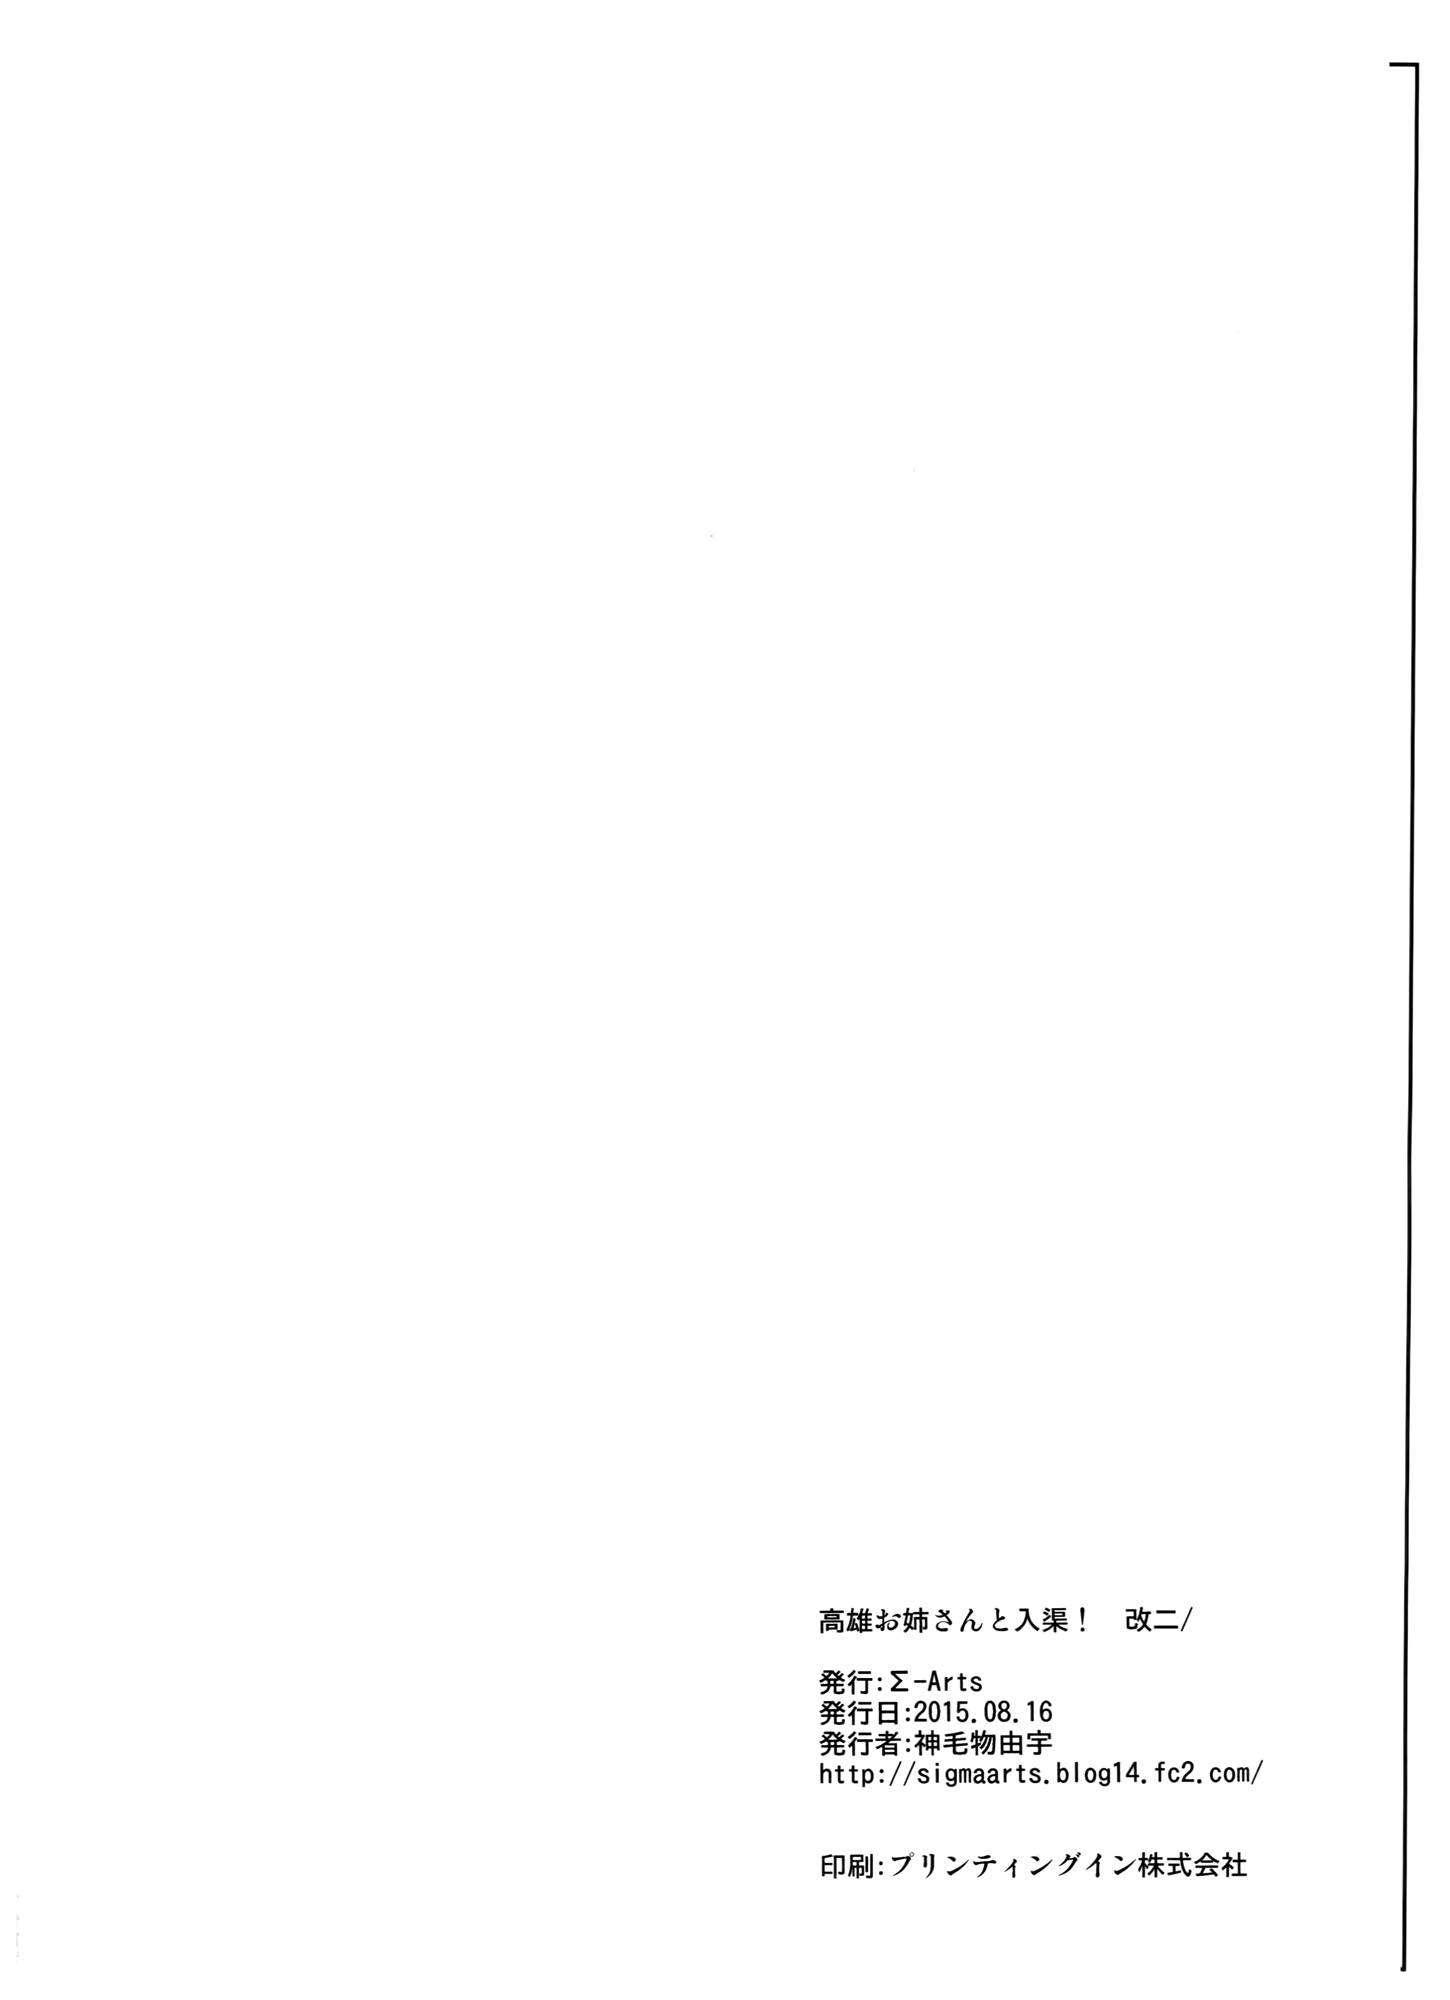 Takao Onee-san to Nyuukyo! Kai Ni Chapter-1 - 21